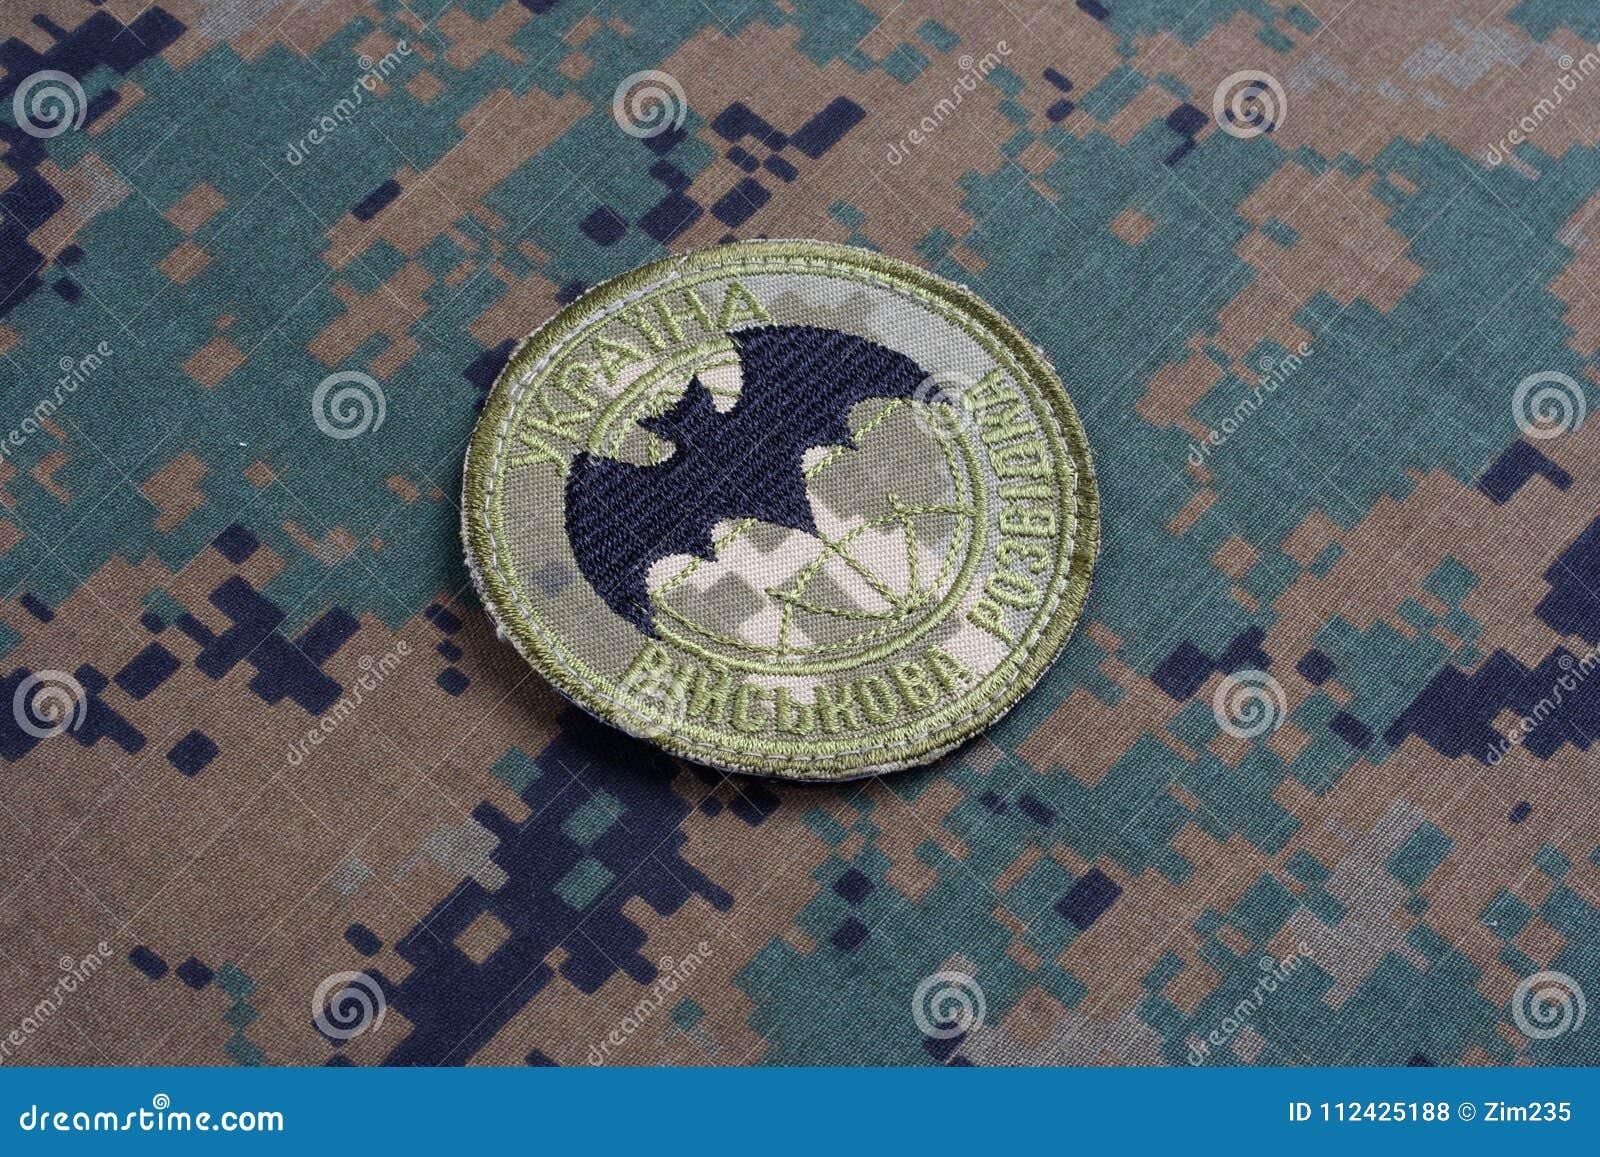 KYIV, UCRANIA - julio, 16, 2015 Insignia del uniforme de la inteligencia militar del ` s de Ucrania